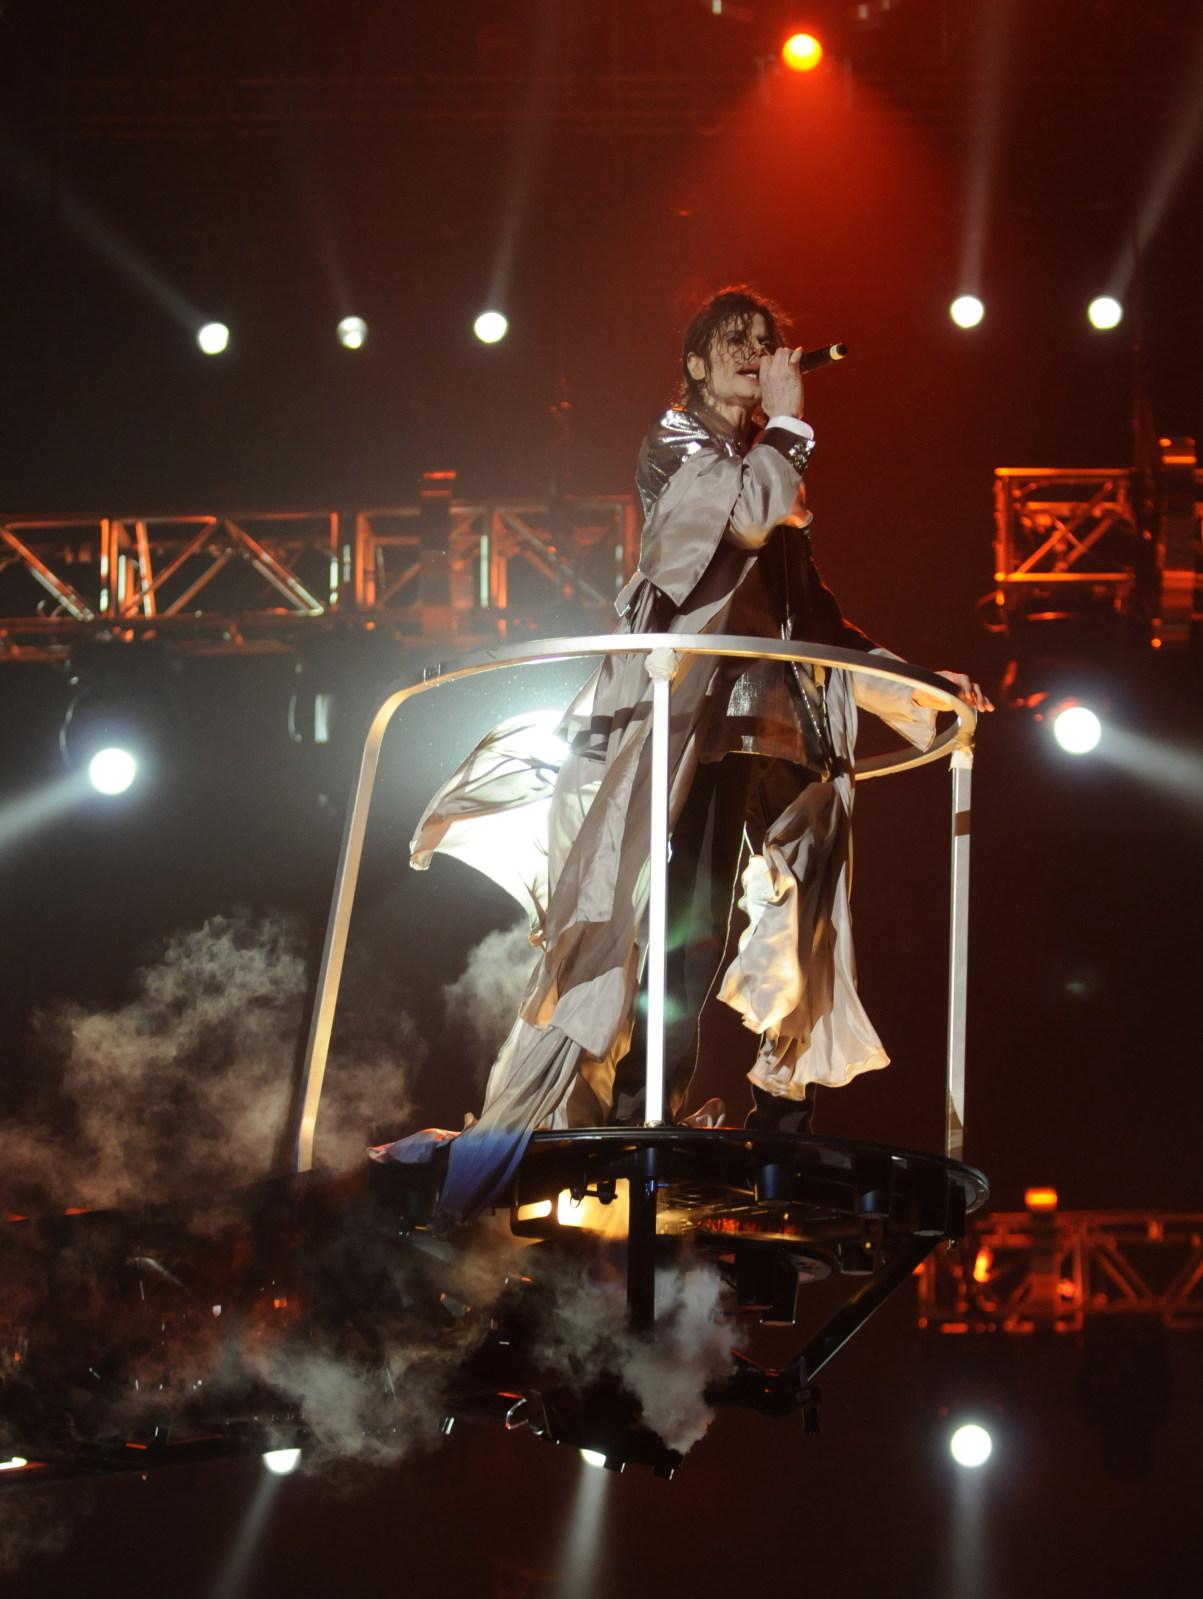 http://2.bp.blogspot.com/__iuYbs5zGVw/TRbWsINoqEI/AAAAAAAAATE/MXfayLN4Iw0/s1600/michael-jackson-this-is-it-singing-lift.jpg